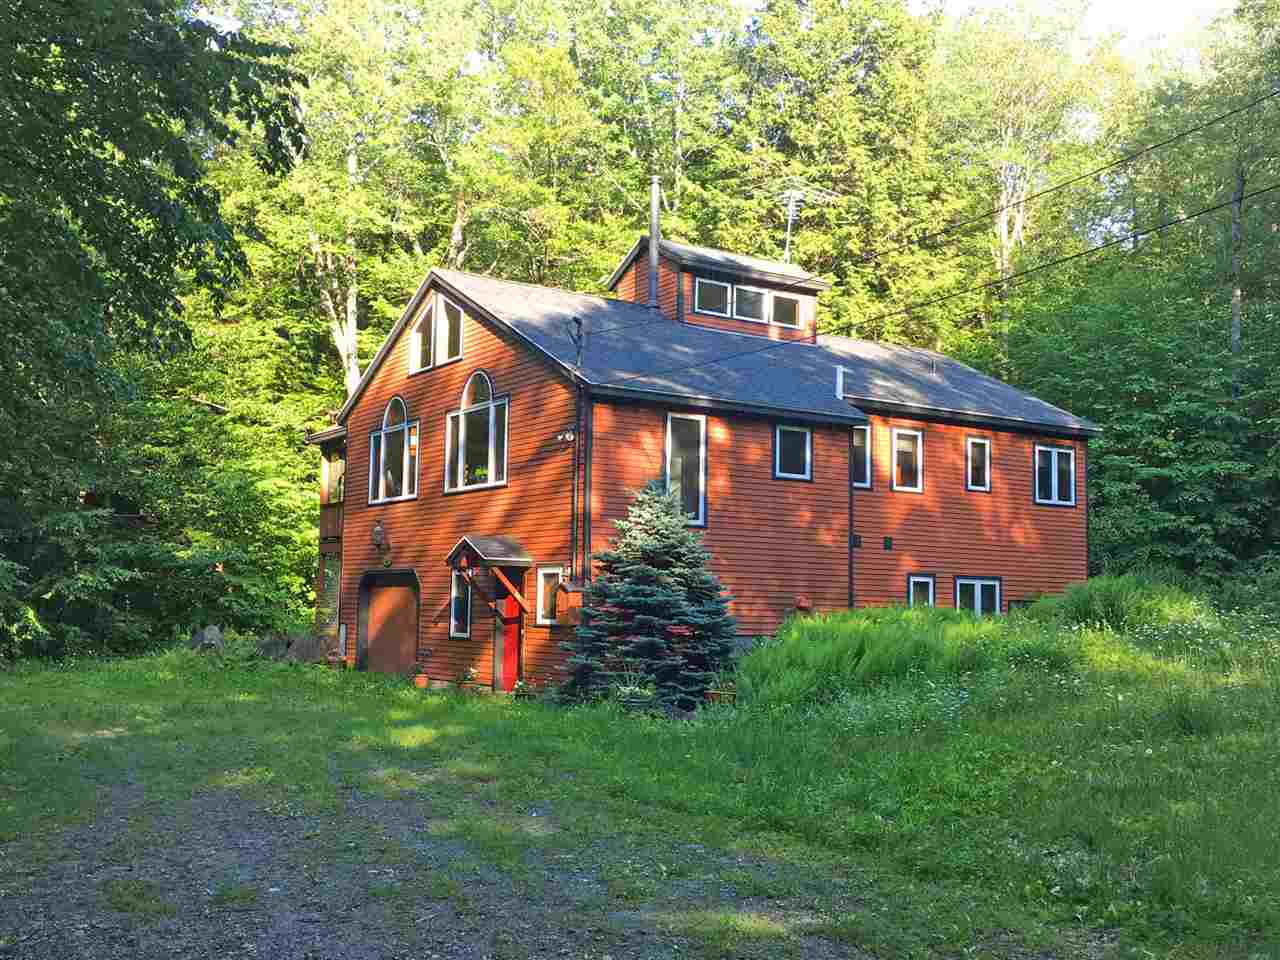 Mount-Snow-Real-Estate-4616332-0